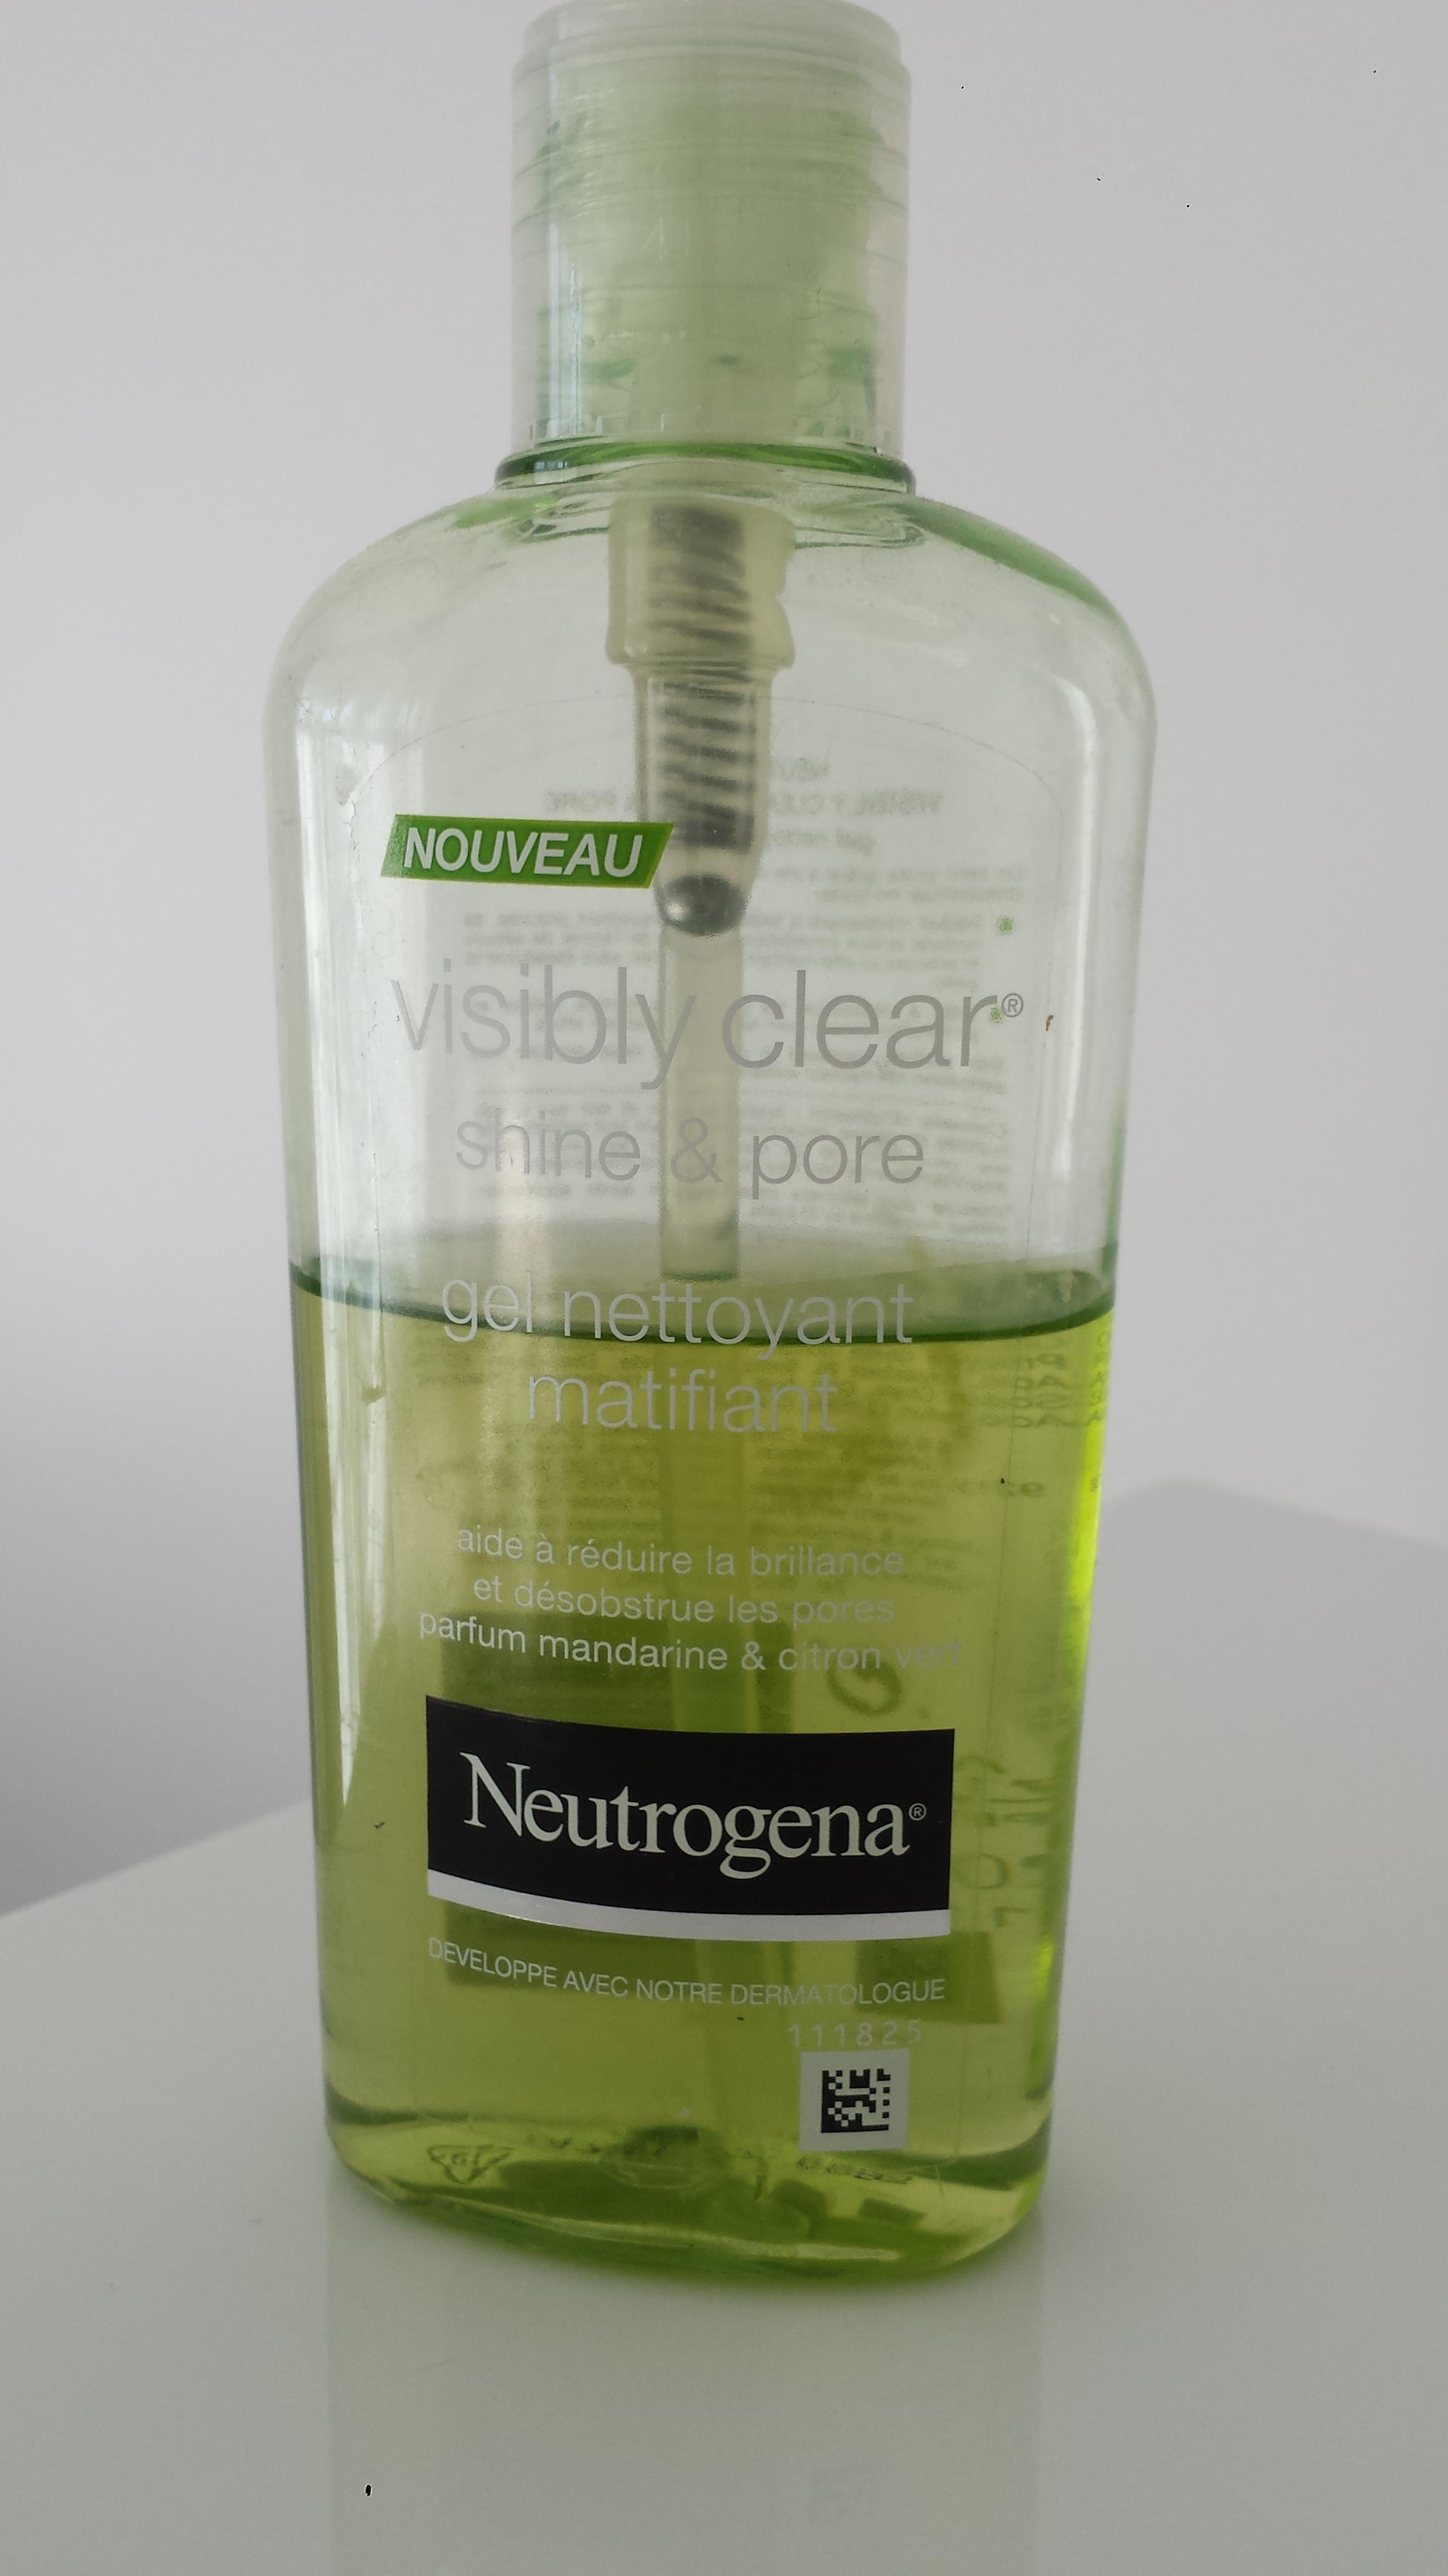 Visibly clear Neutrogena.jpg